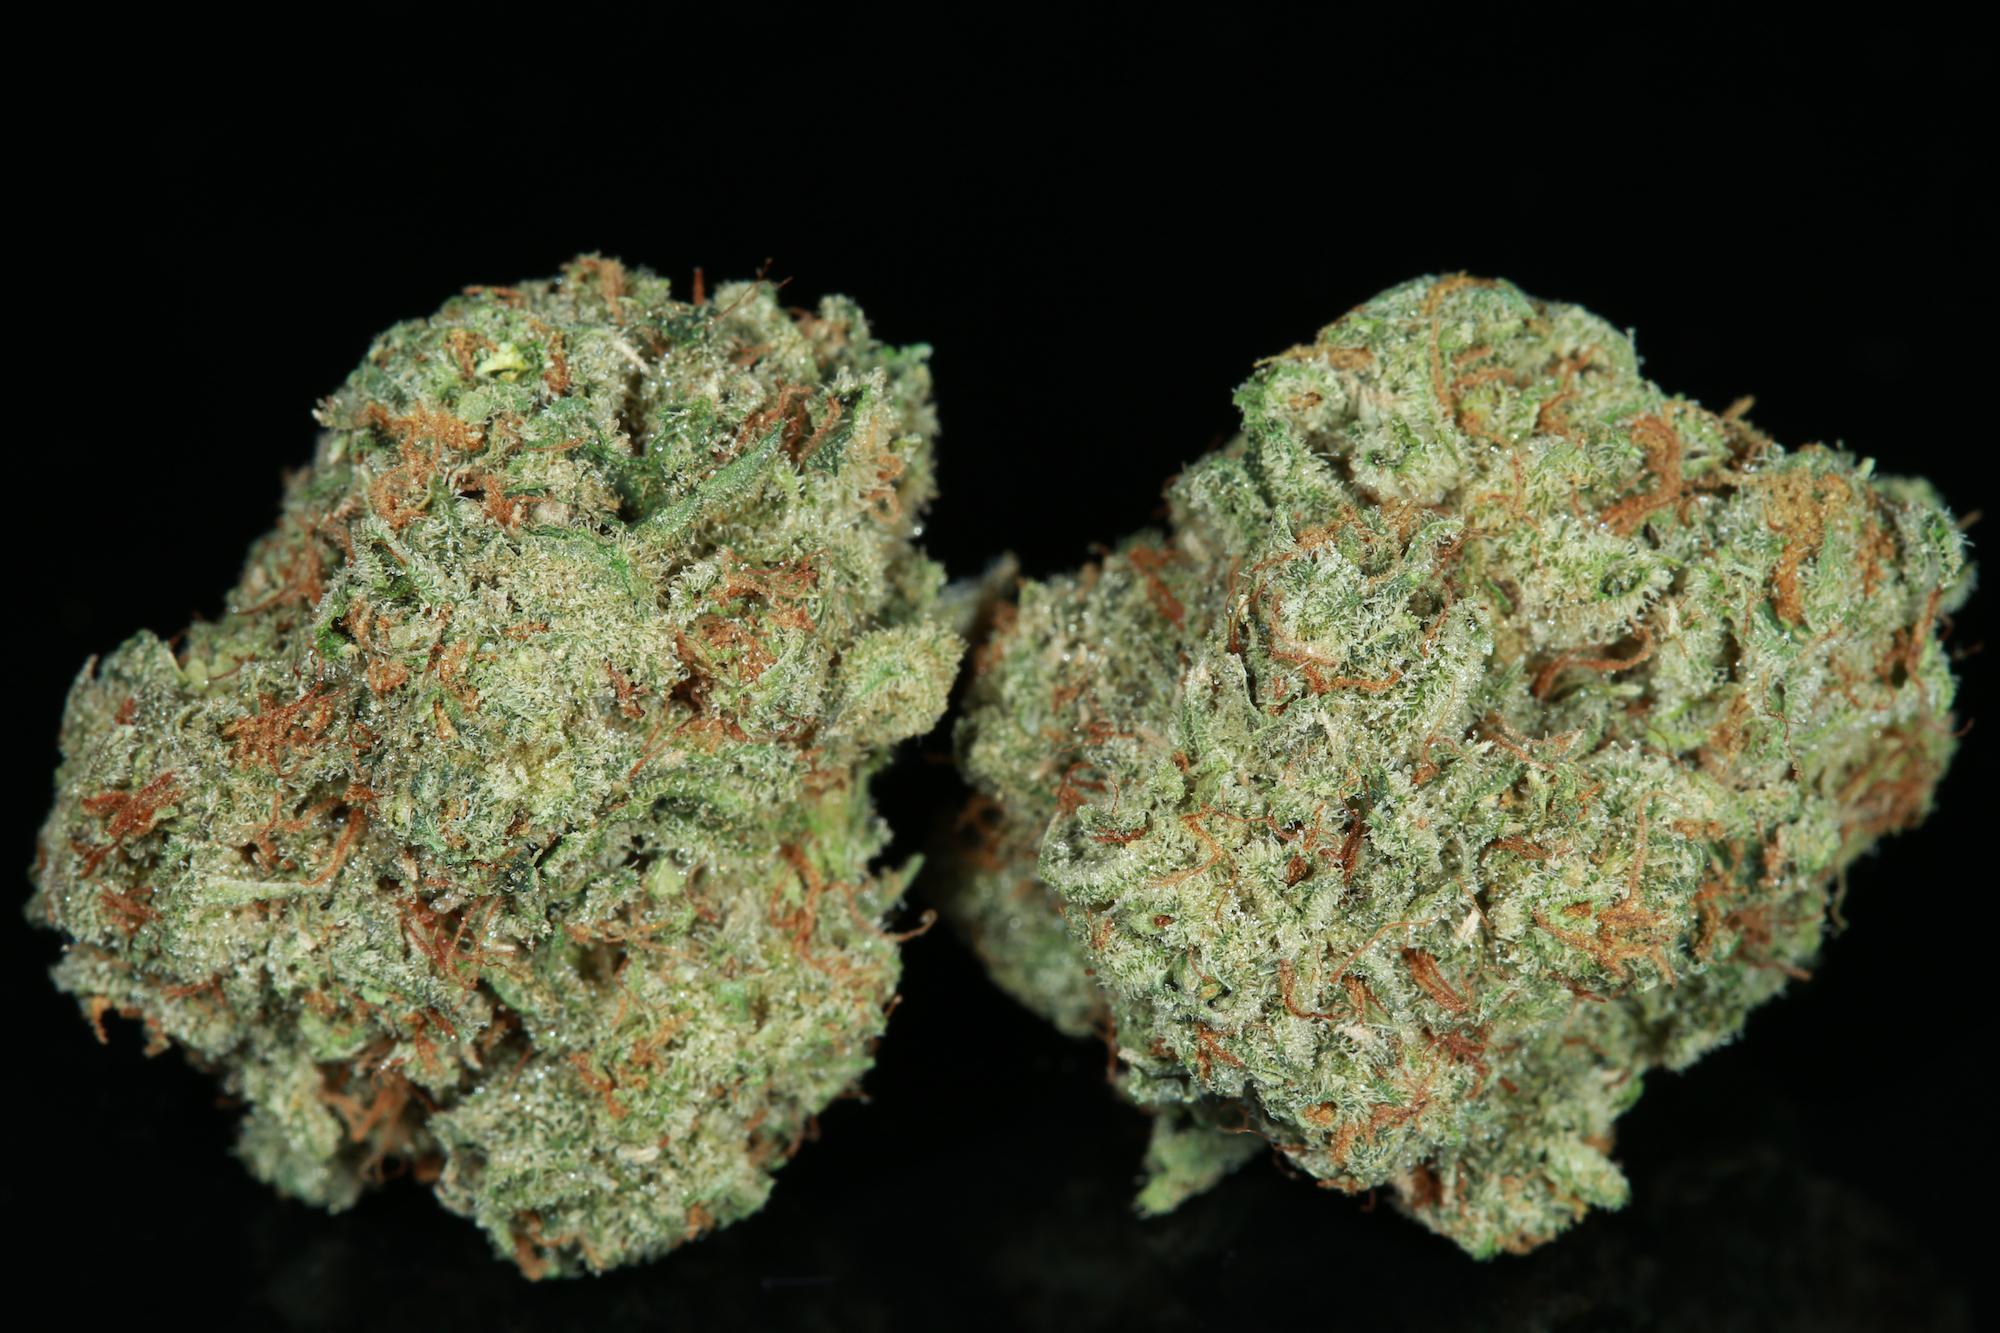 chocolito-marijuana-matrix-nevada-best-weed-ever-chocolope-tangie-3